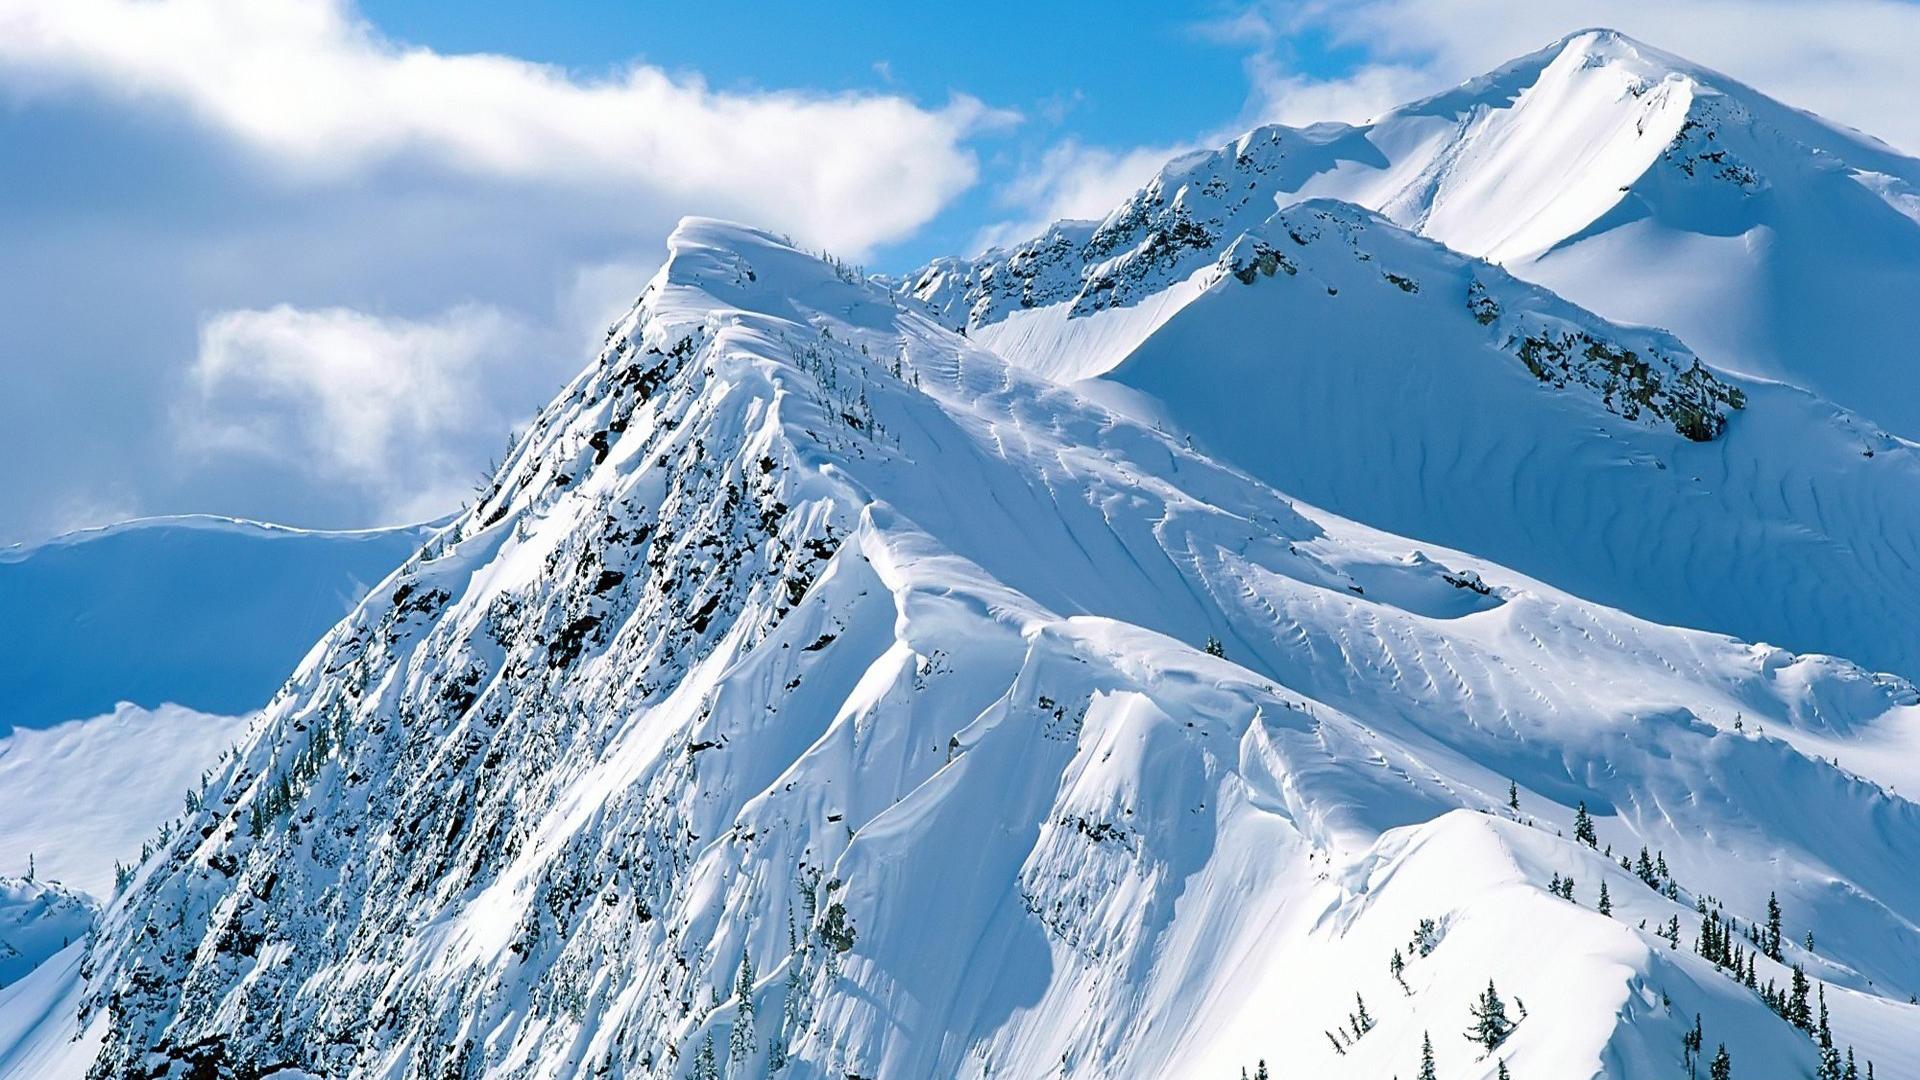 Beautiful Snowy Mountain Wallpaper